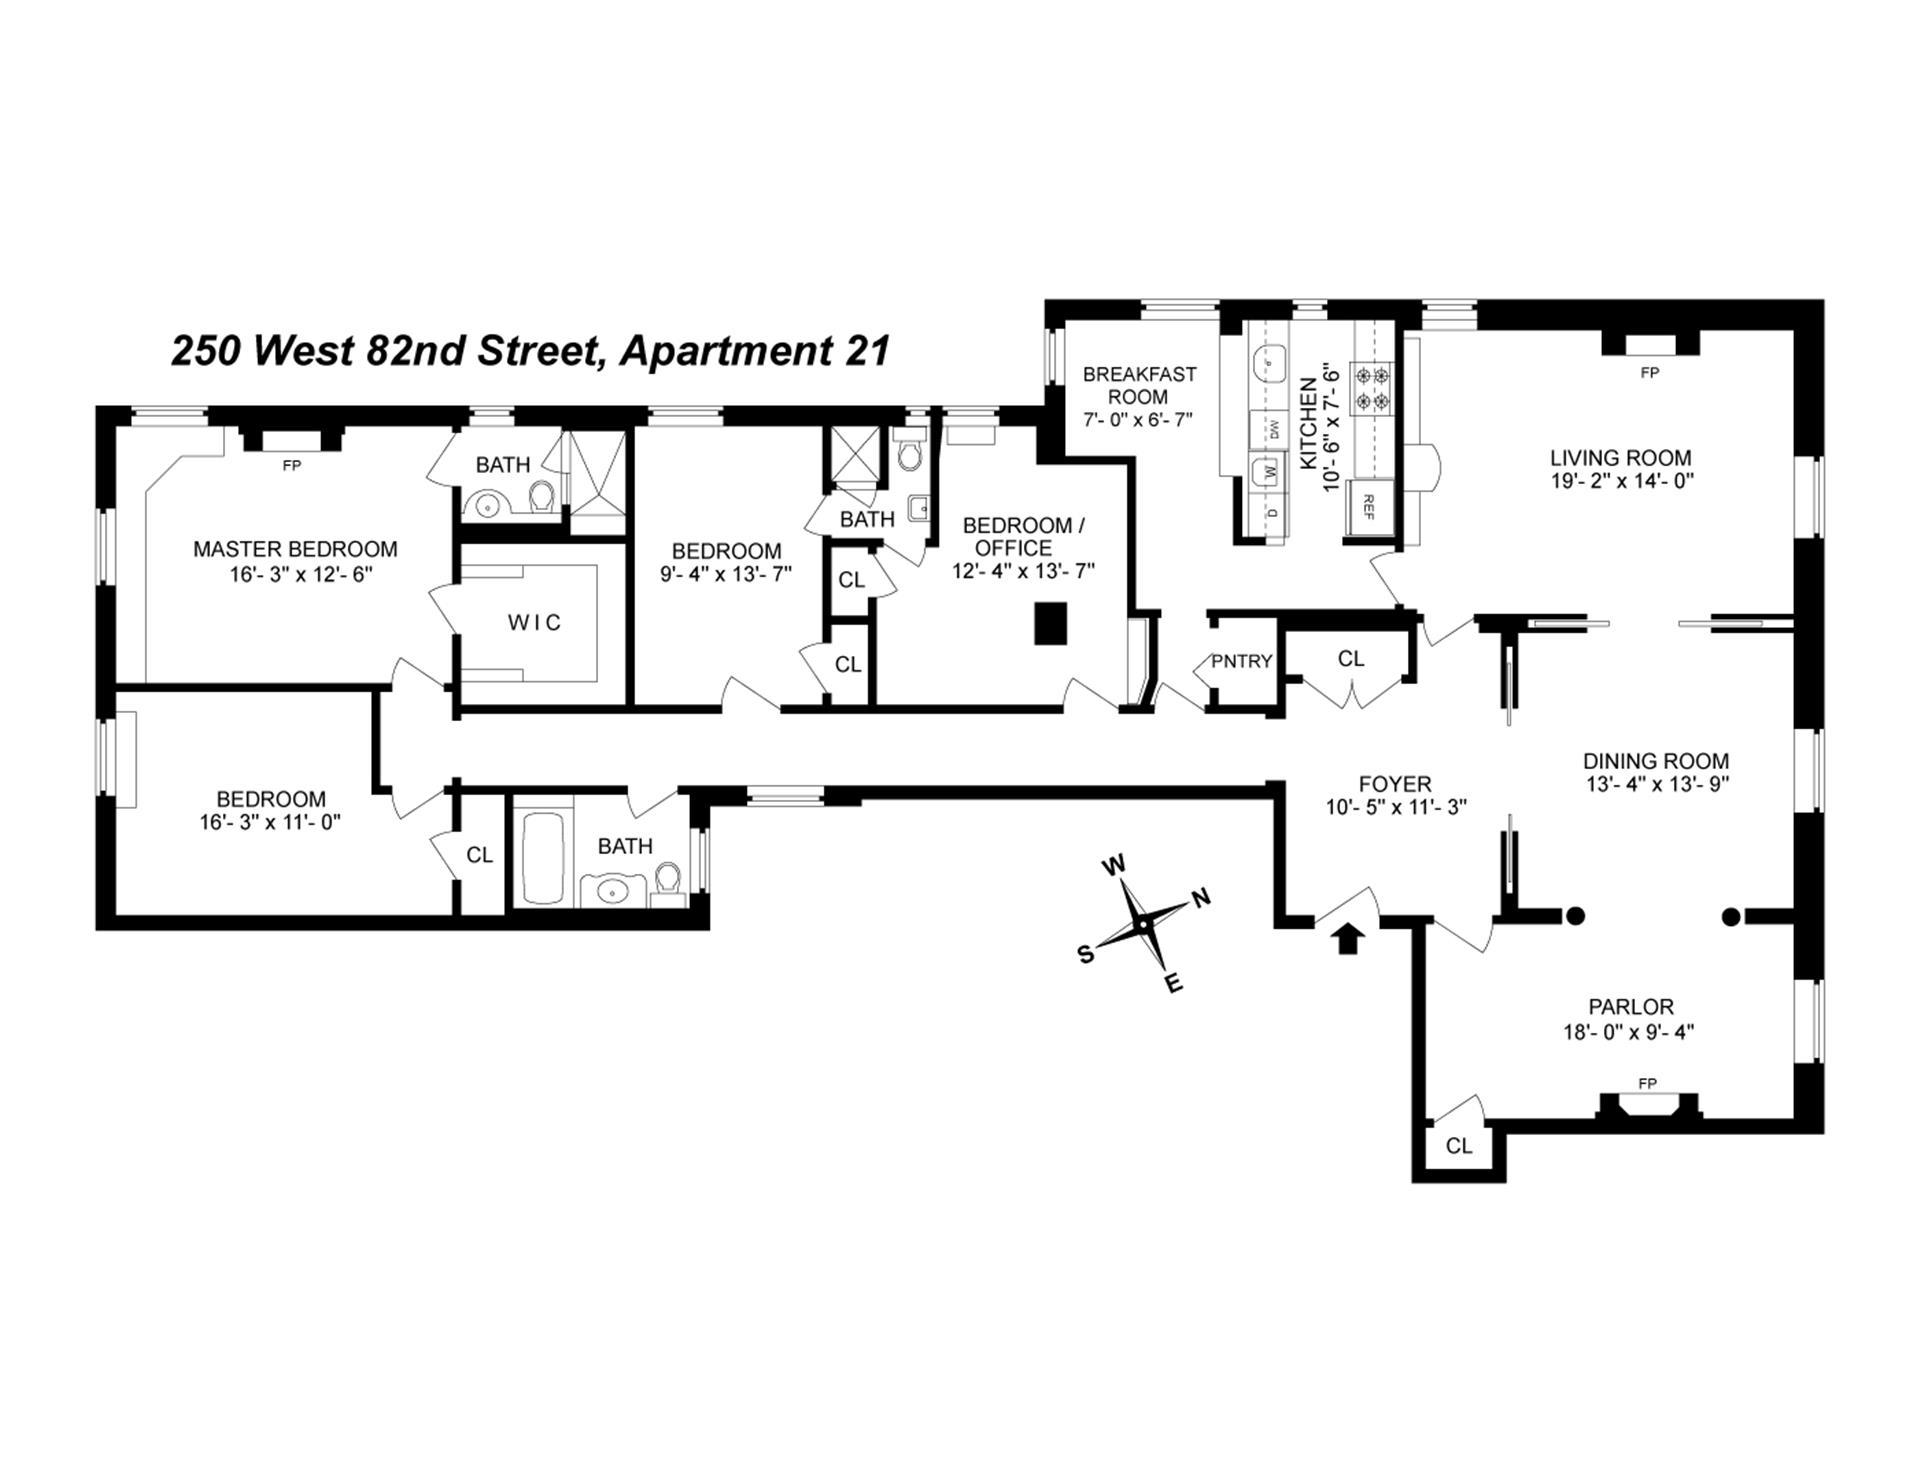 Floor plan of 250 West 82nd Street, 21 - Upper West Side, New York